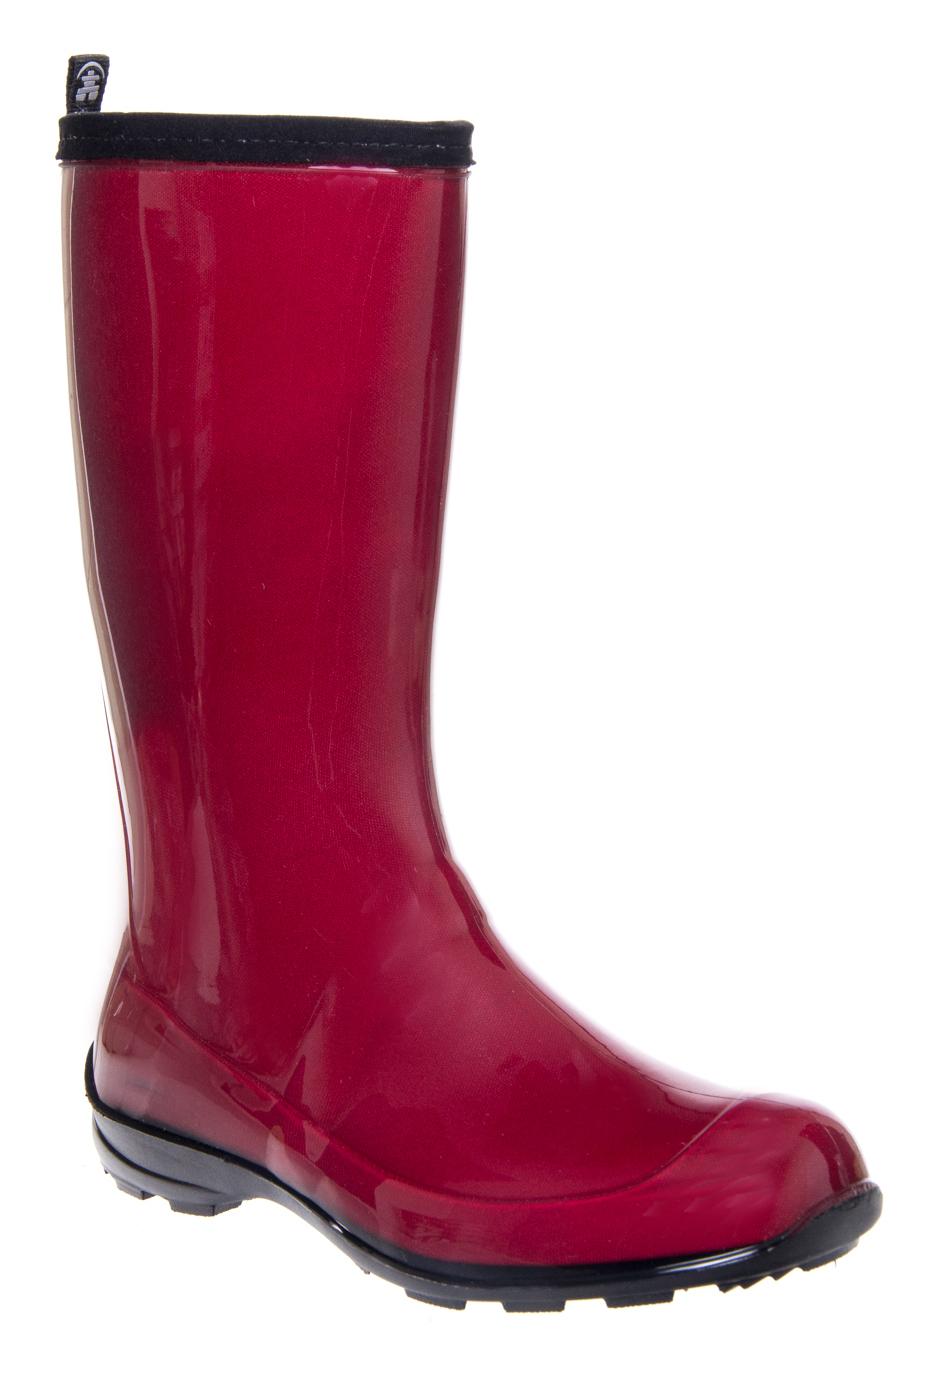 KAMIK Heidi Tall Lug Sole Rain Boots  - Red